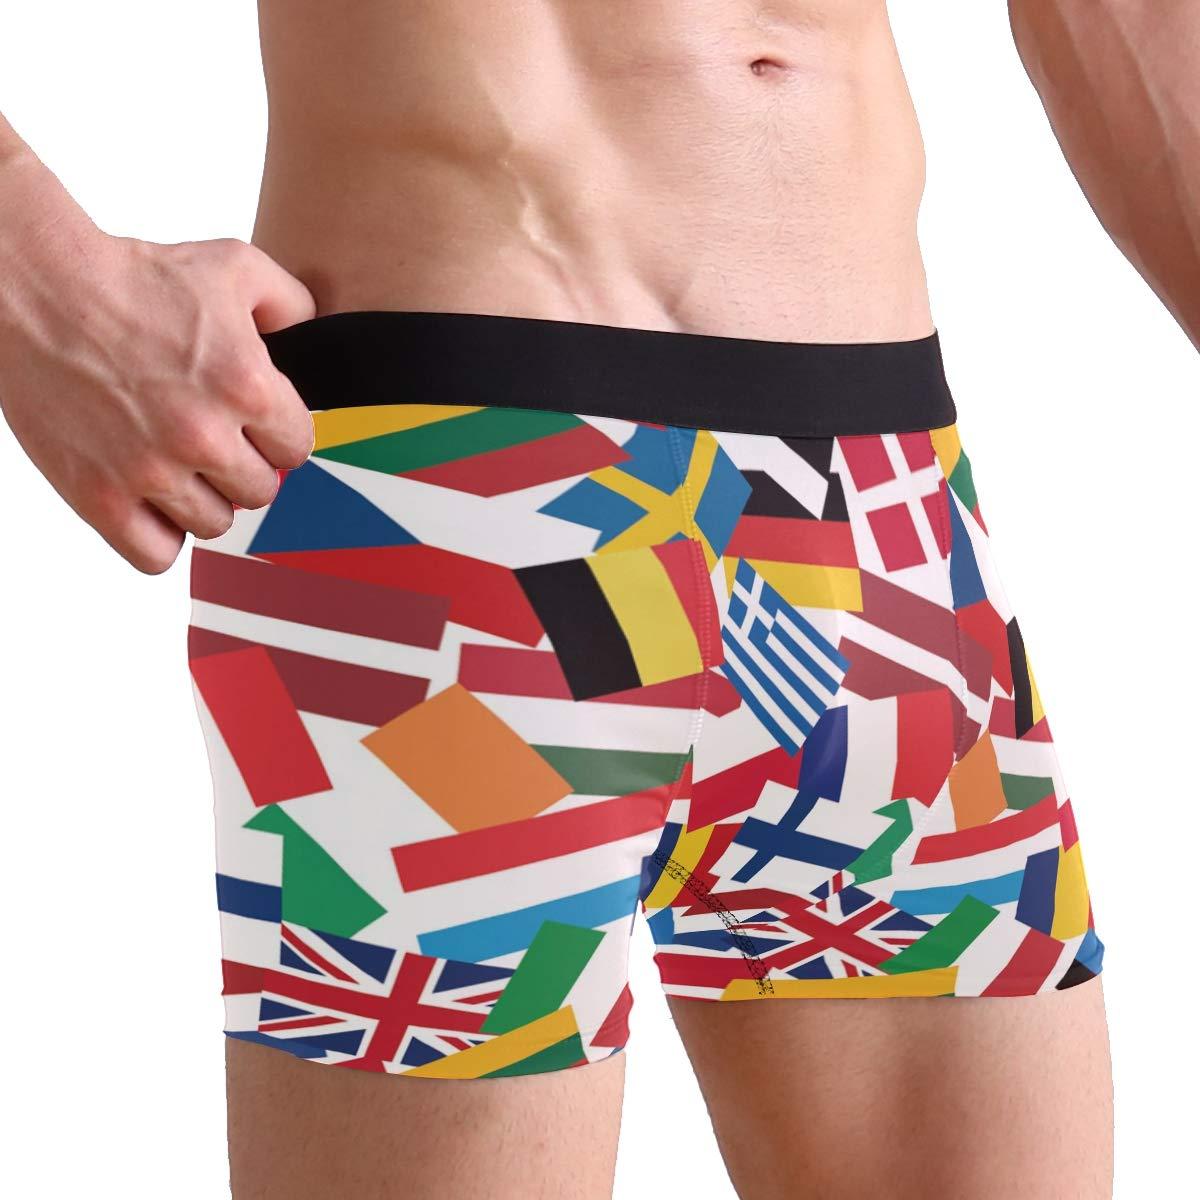 Anyangquji Flags of European Countries Boxer Briefs Mens Underwear